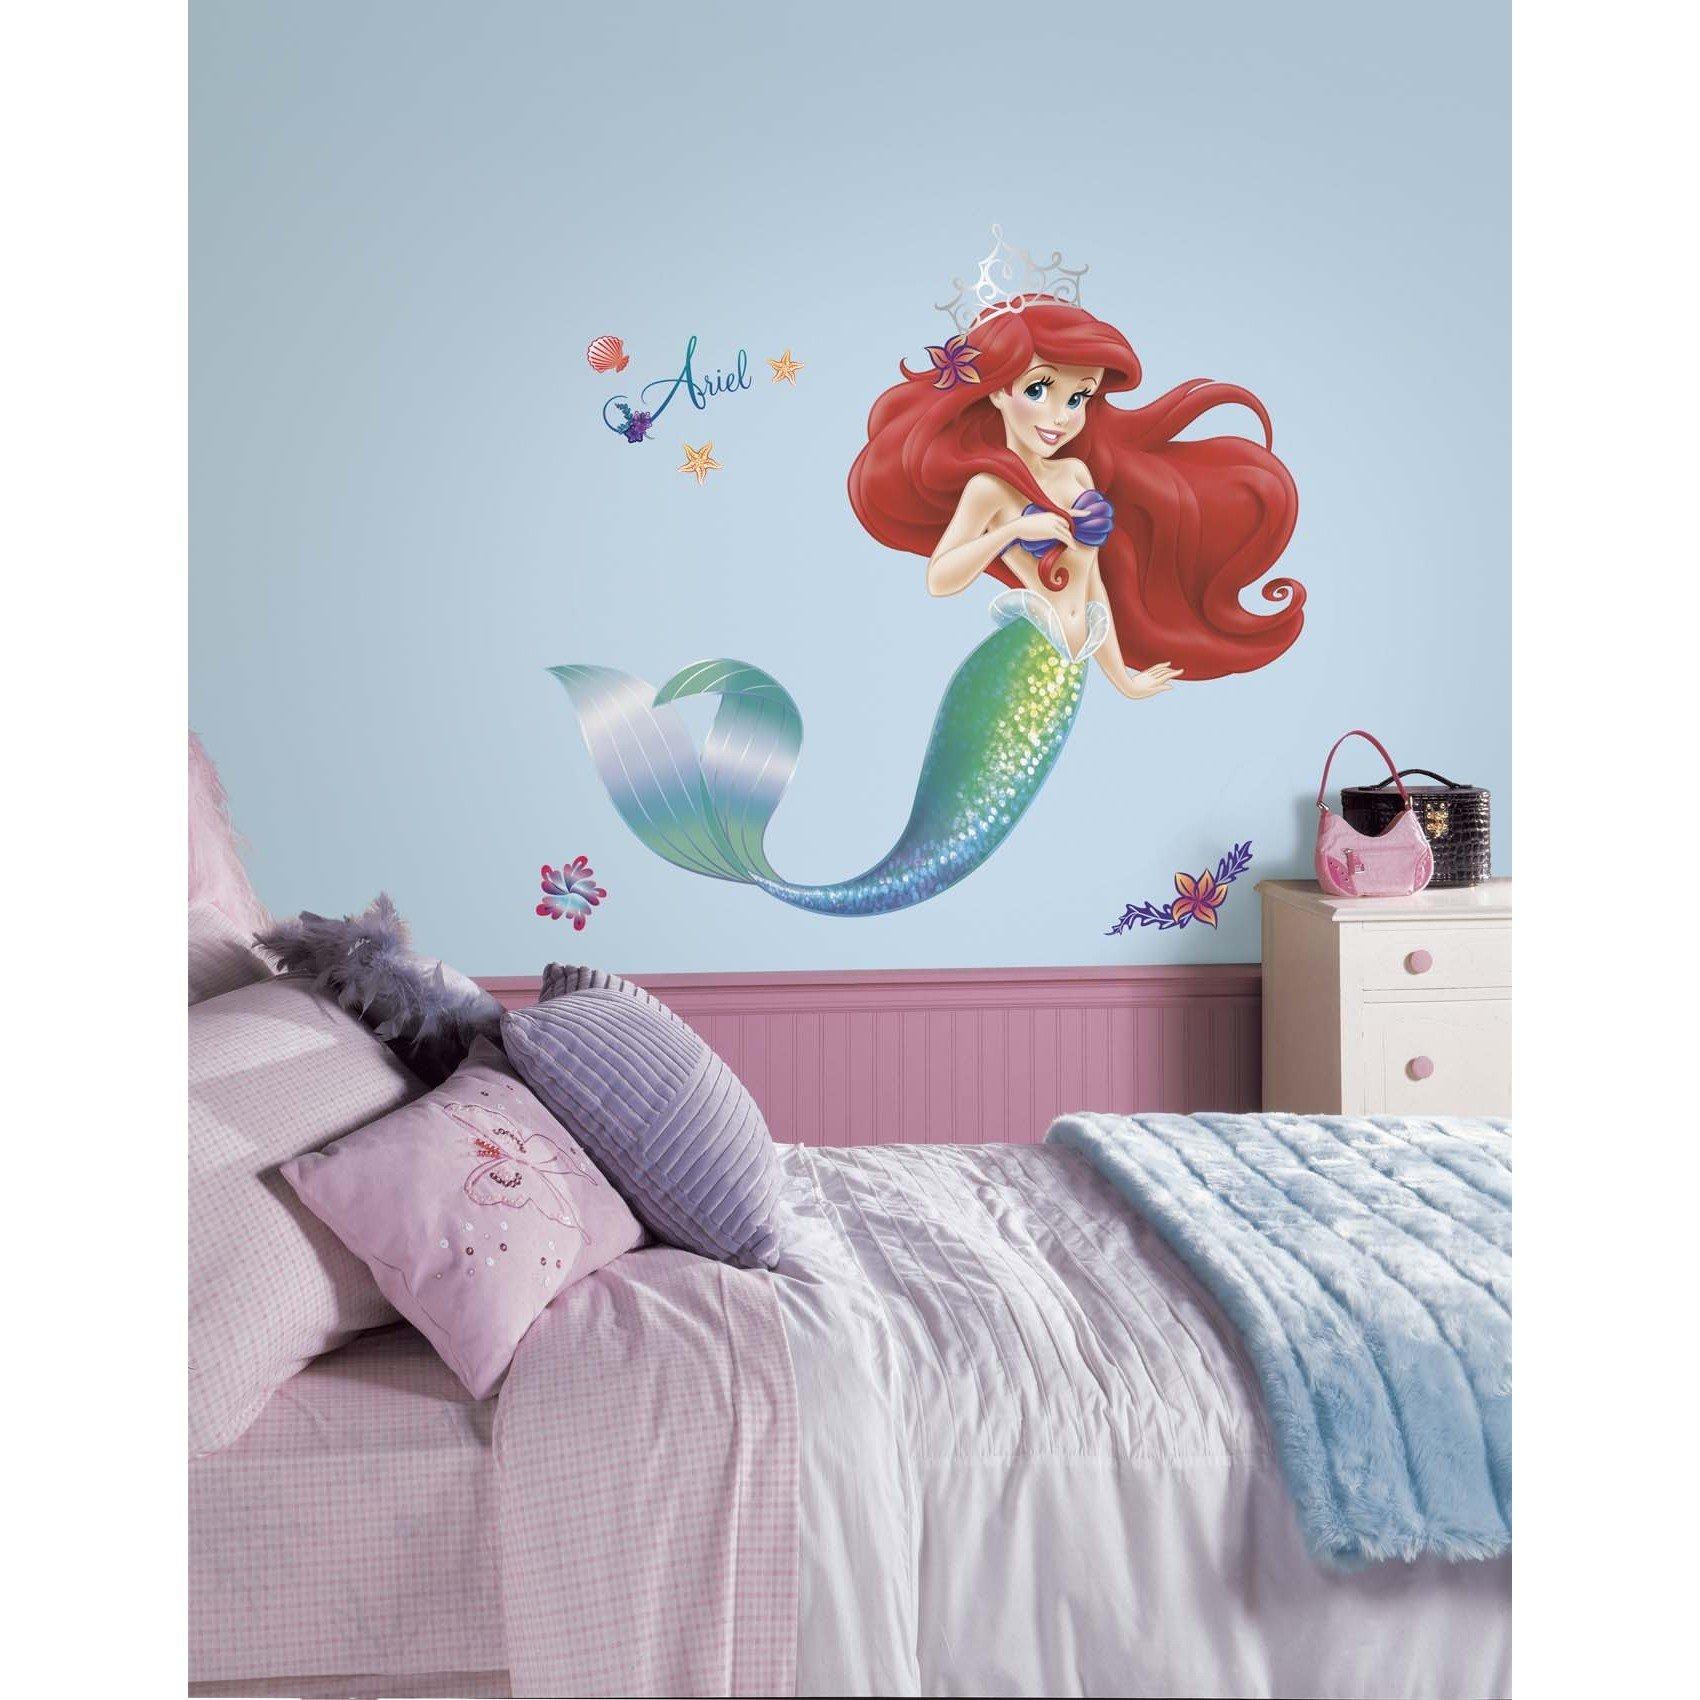 21 Piece Kids Green Purple Red Little Mermaid Wall Decals Set, Disney Themed Wall Stickers Peel Stick, Movie Classic Princess Ariel Fish Ocean Water Sea Sparkling Shells Decorative Mural Art, Vinyl